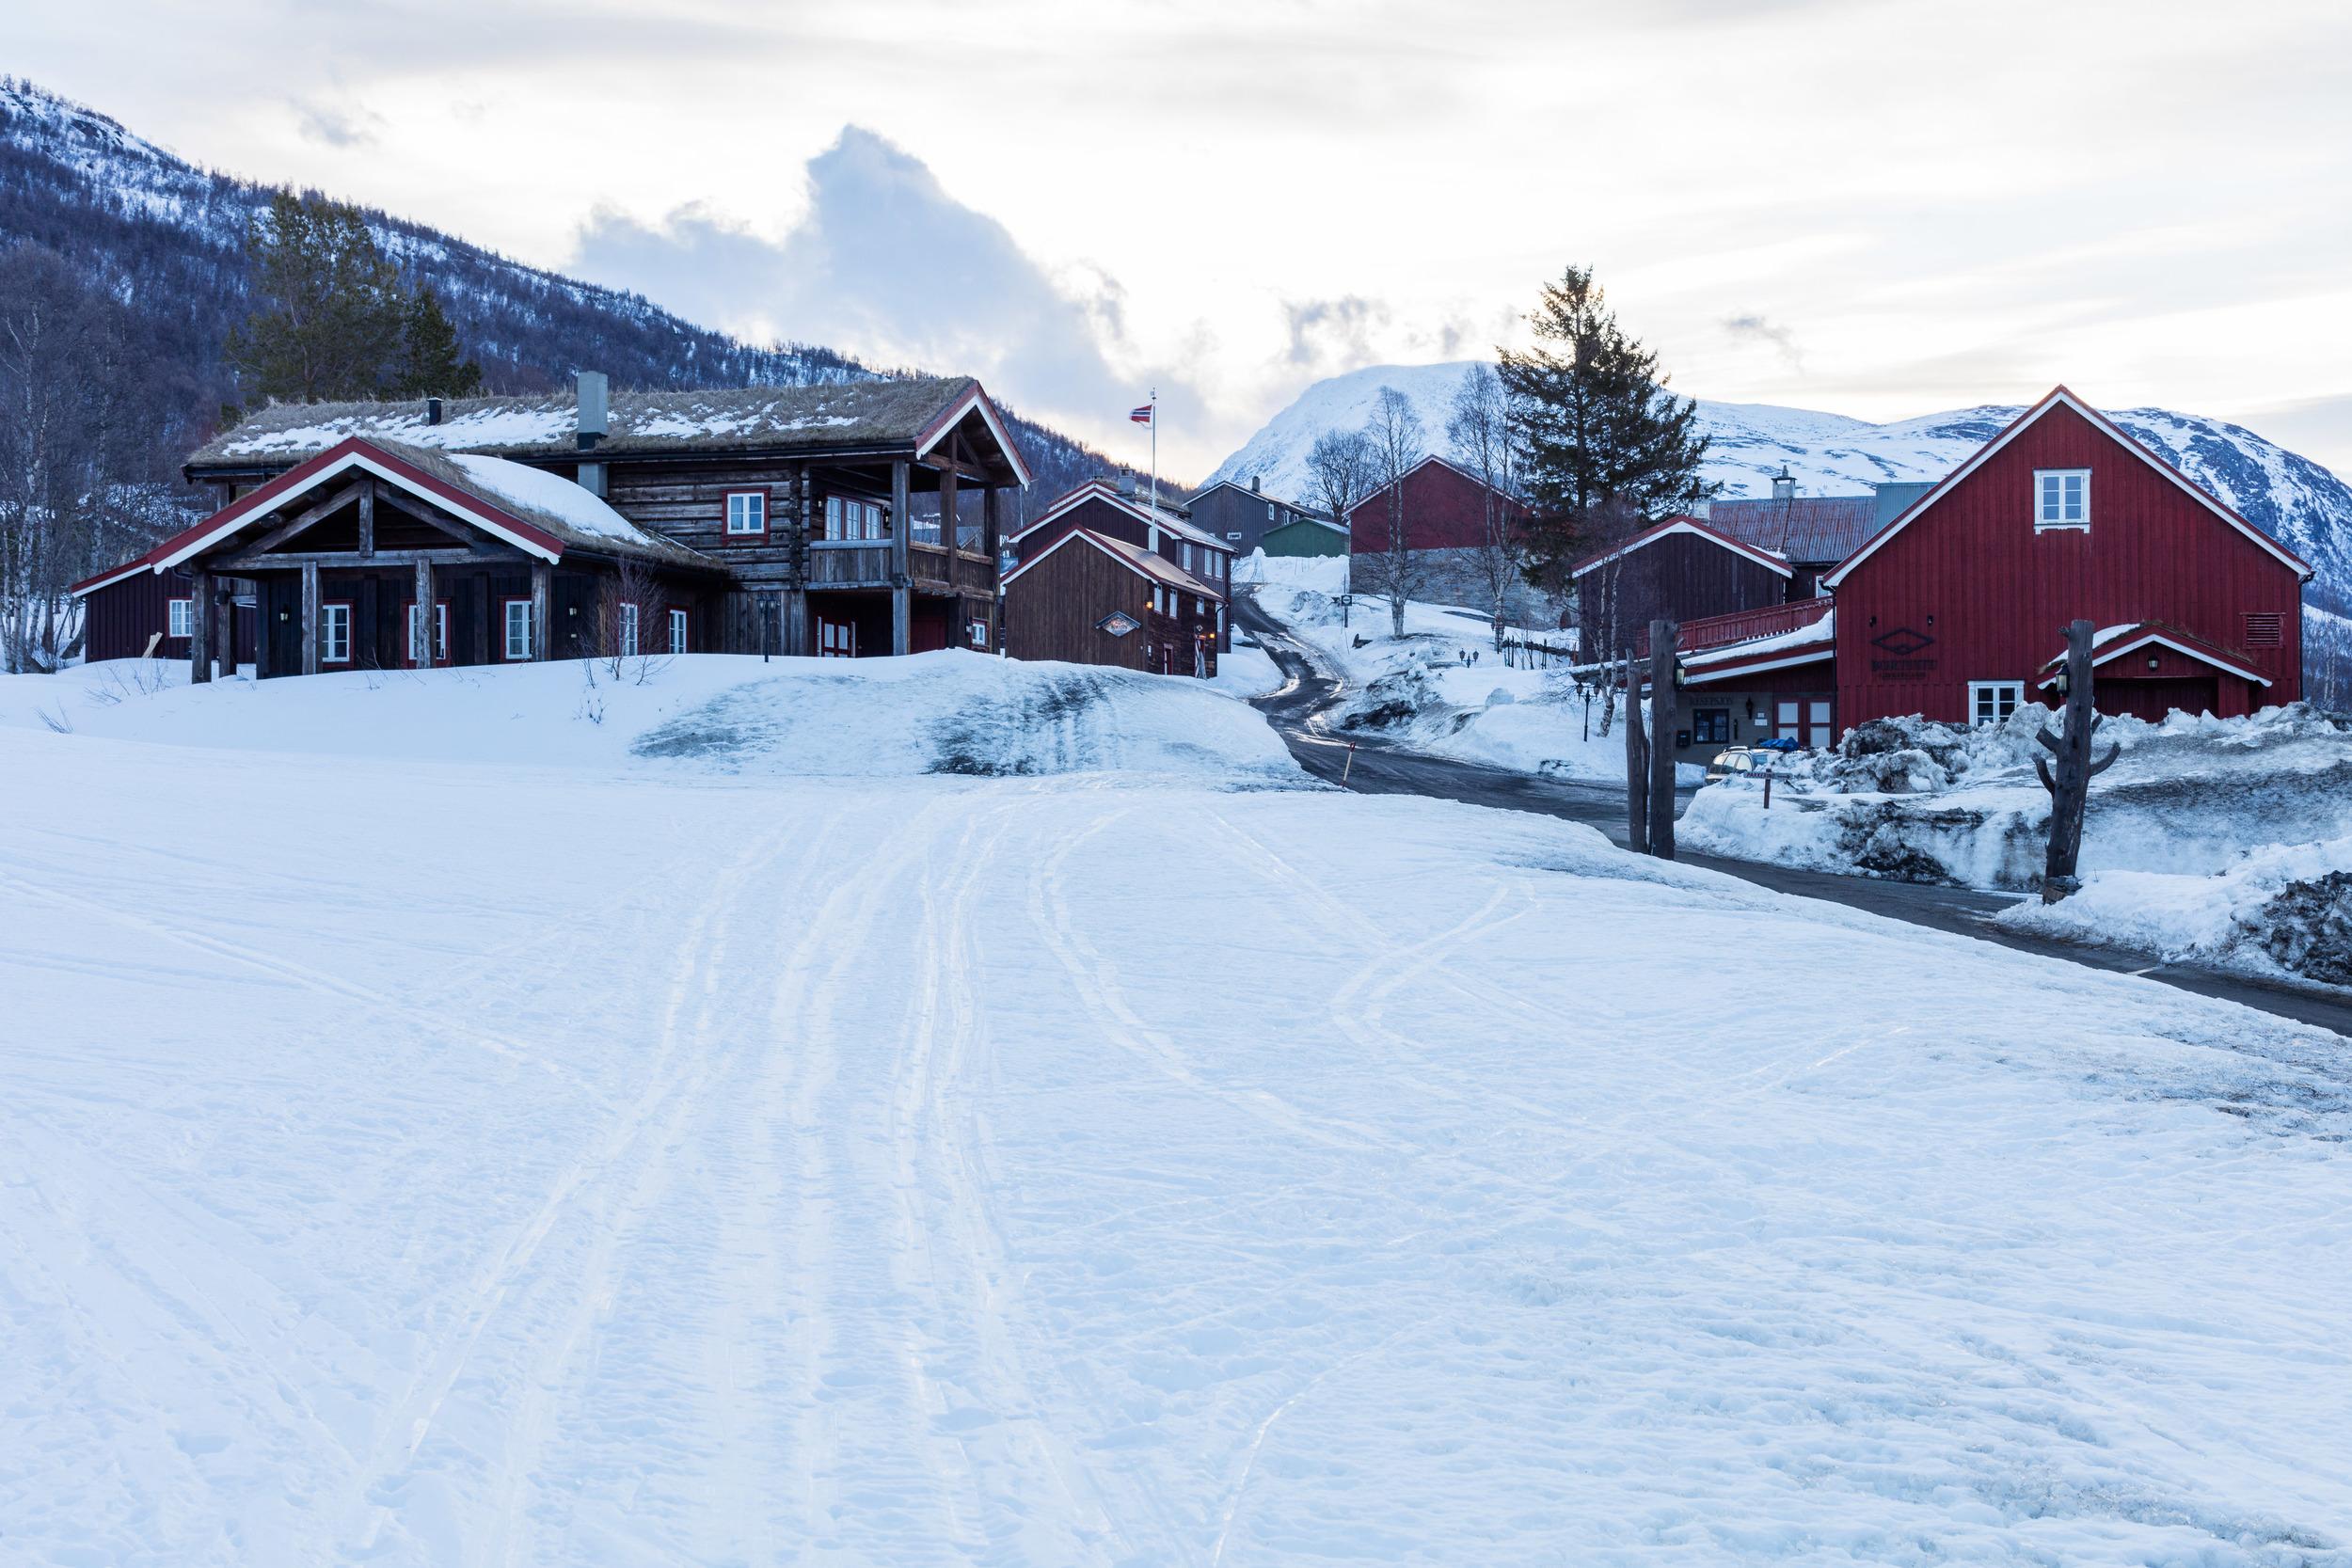 Bortistu-Storlidalen-Oppdal-Norge-Sven-Erik-Knoff-FotoKnoff-61.jpg